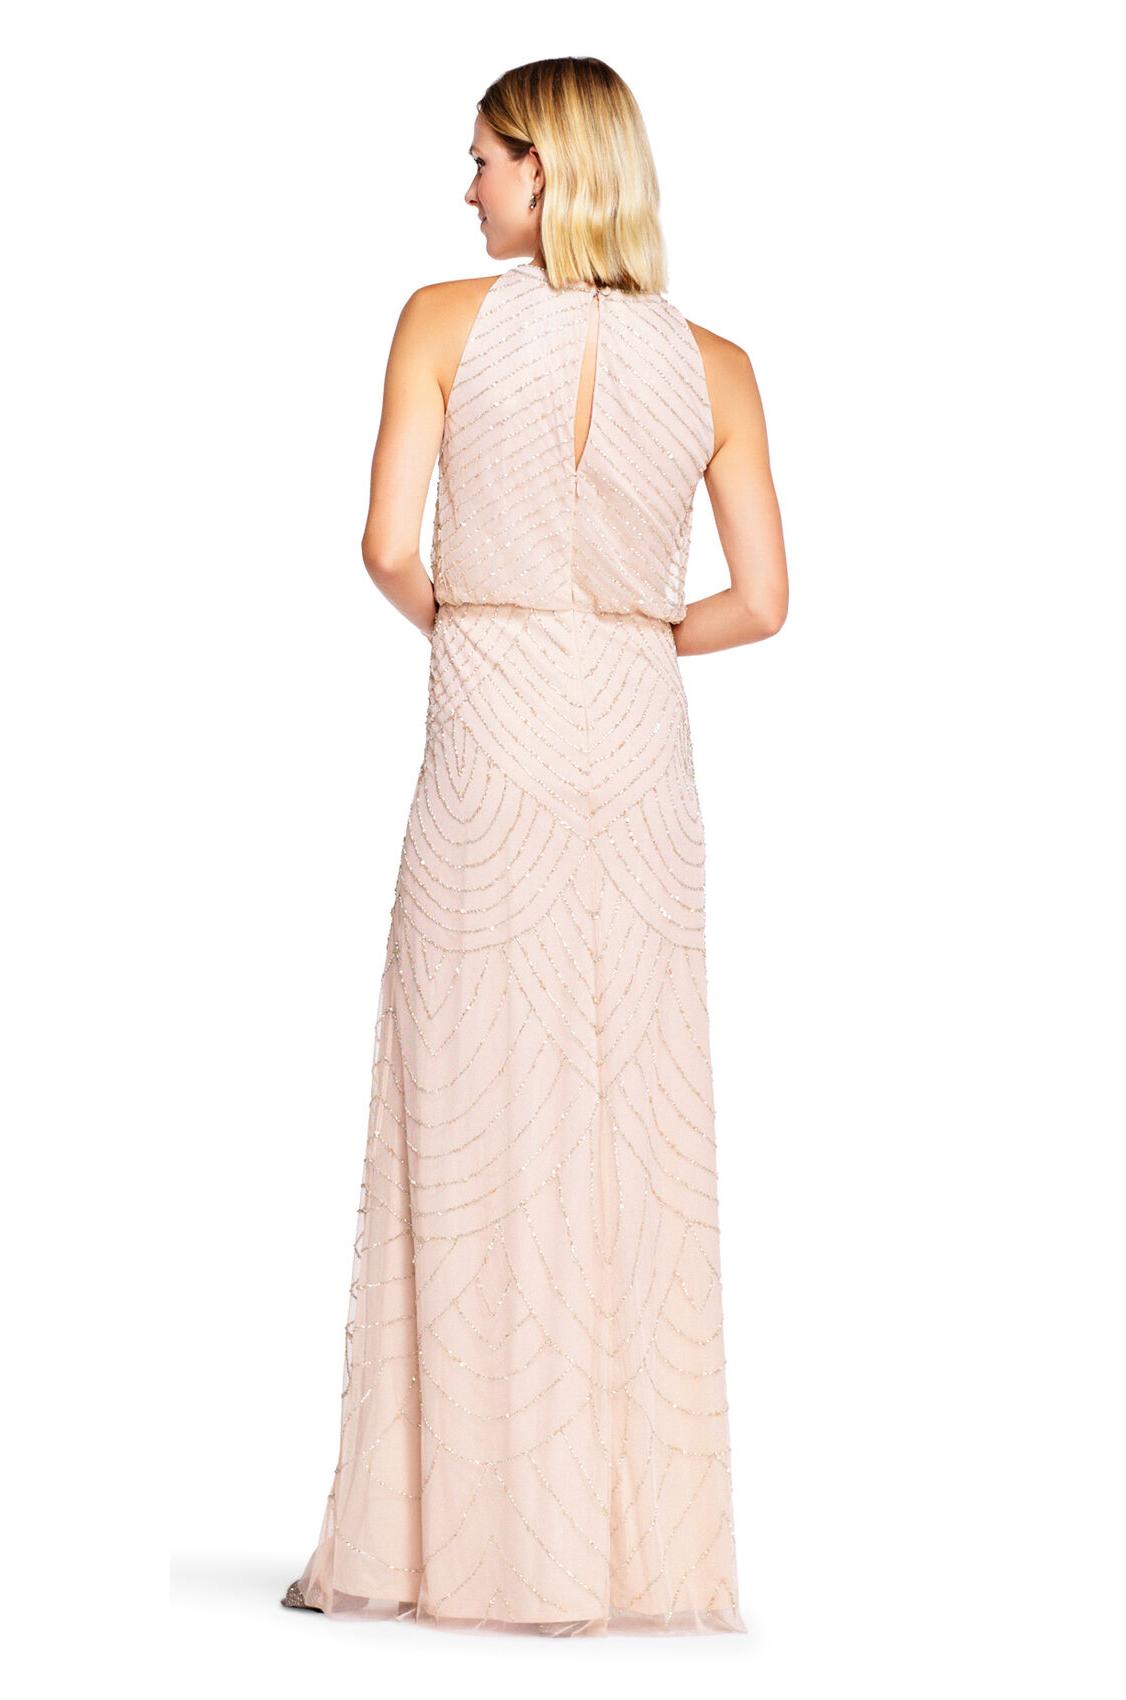 Nouveau Halter Art Deco Beaded Blouson Dress By Adrianna Papell - Blush